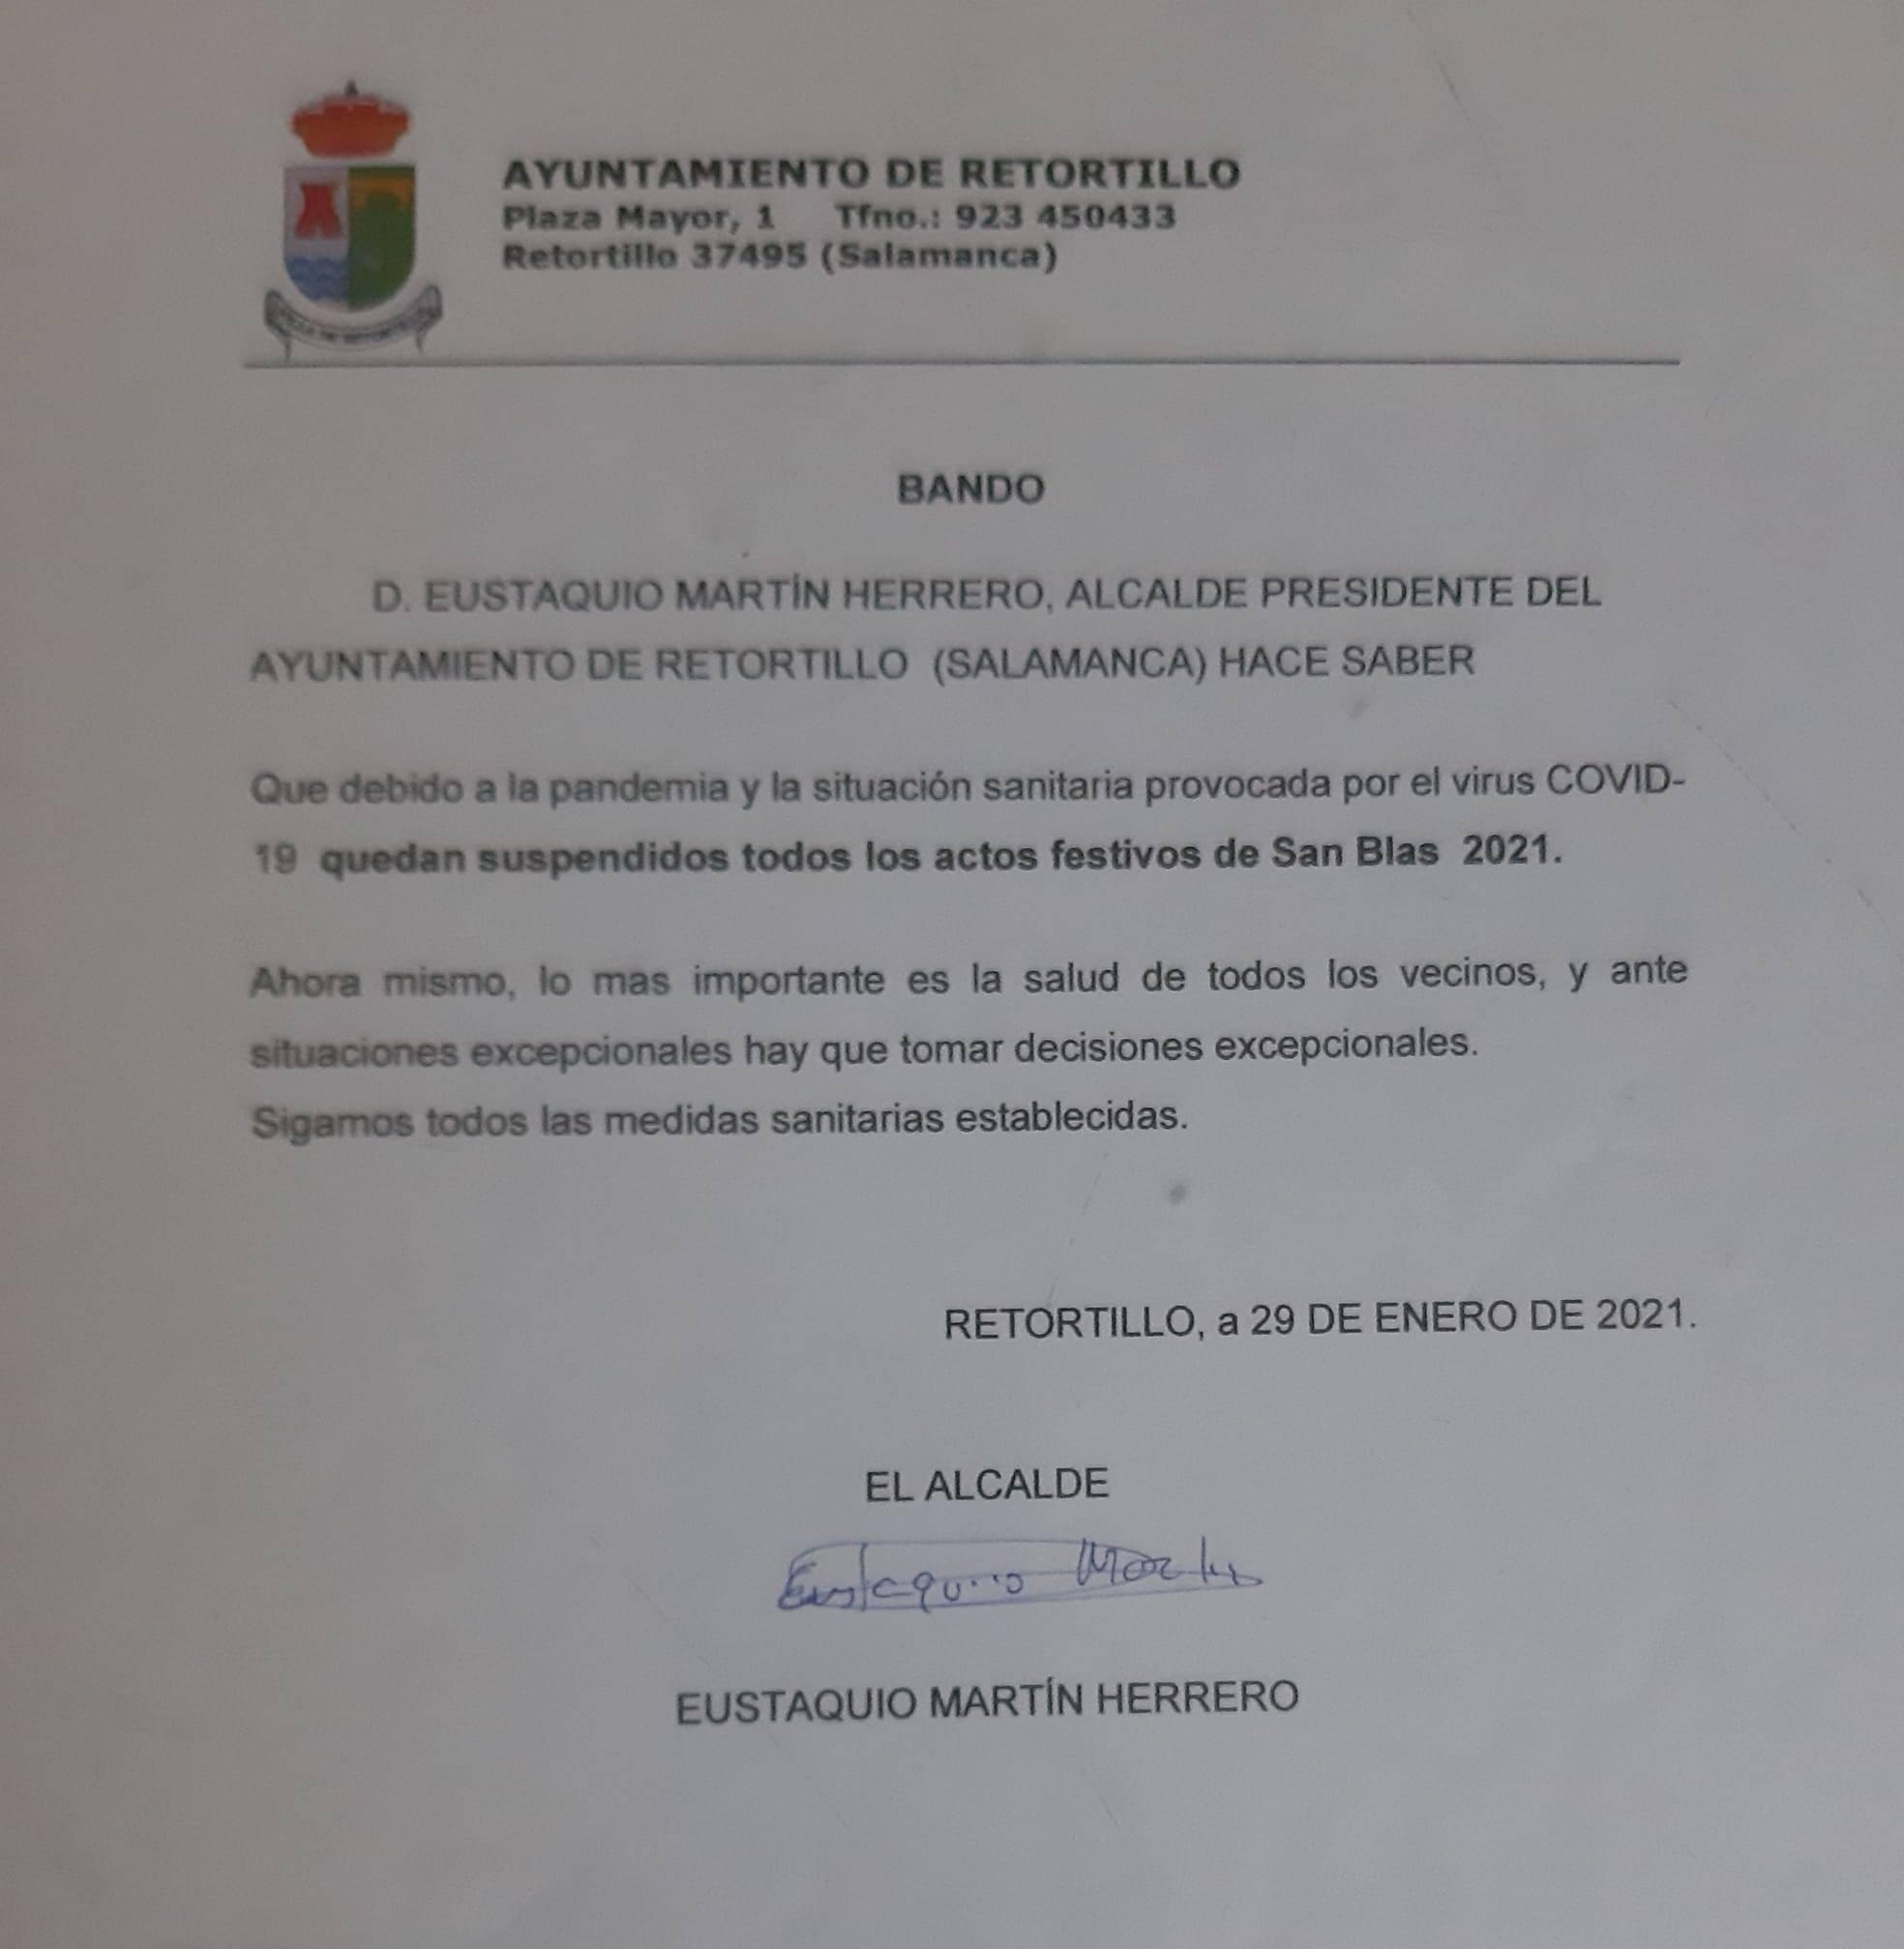 Suspendido San Blas (2021) - Retortillo (Salamanca)